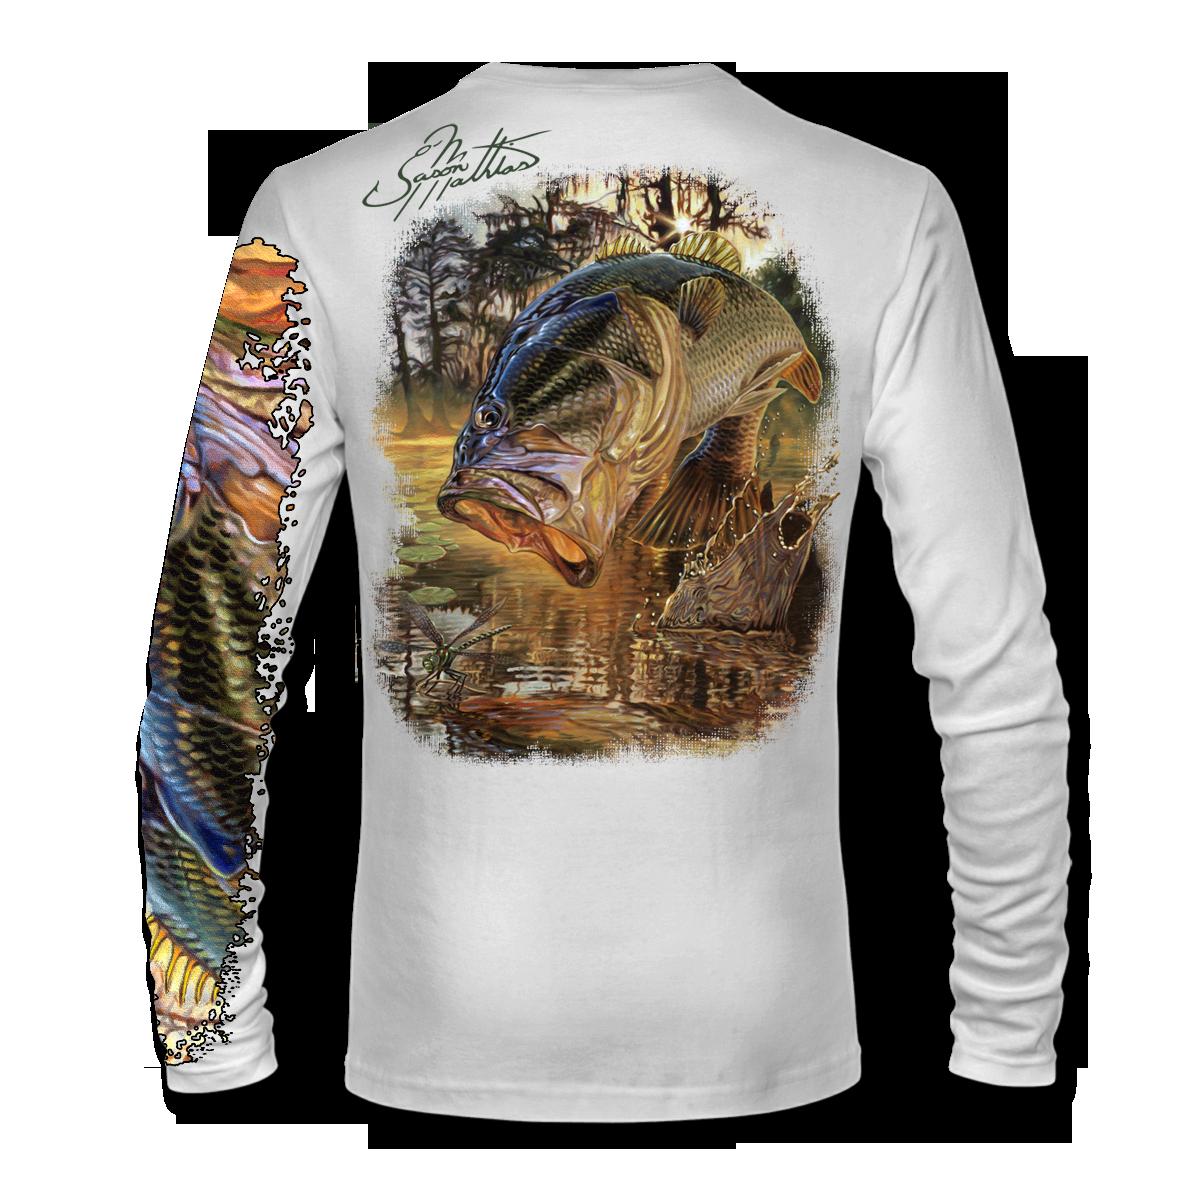 jason-mathias-large-mouth-bass-t-shirt-high-performance-gear-and-wear.png